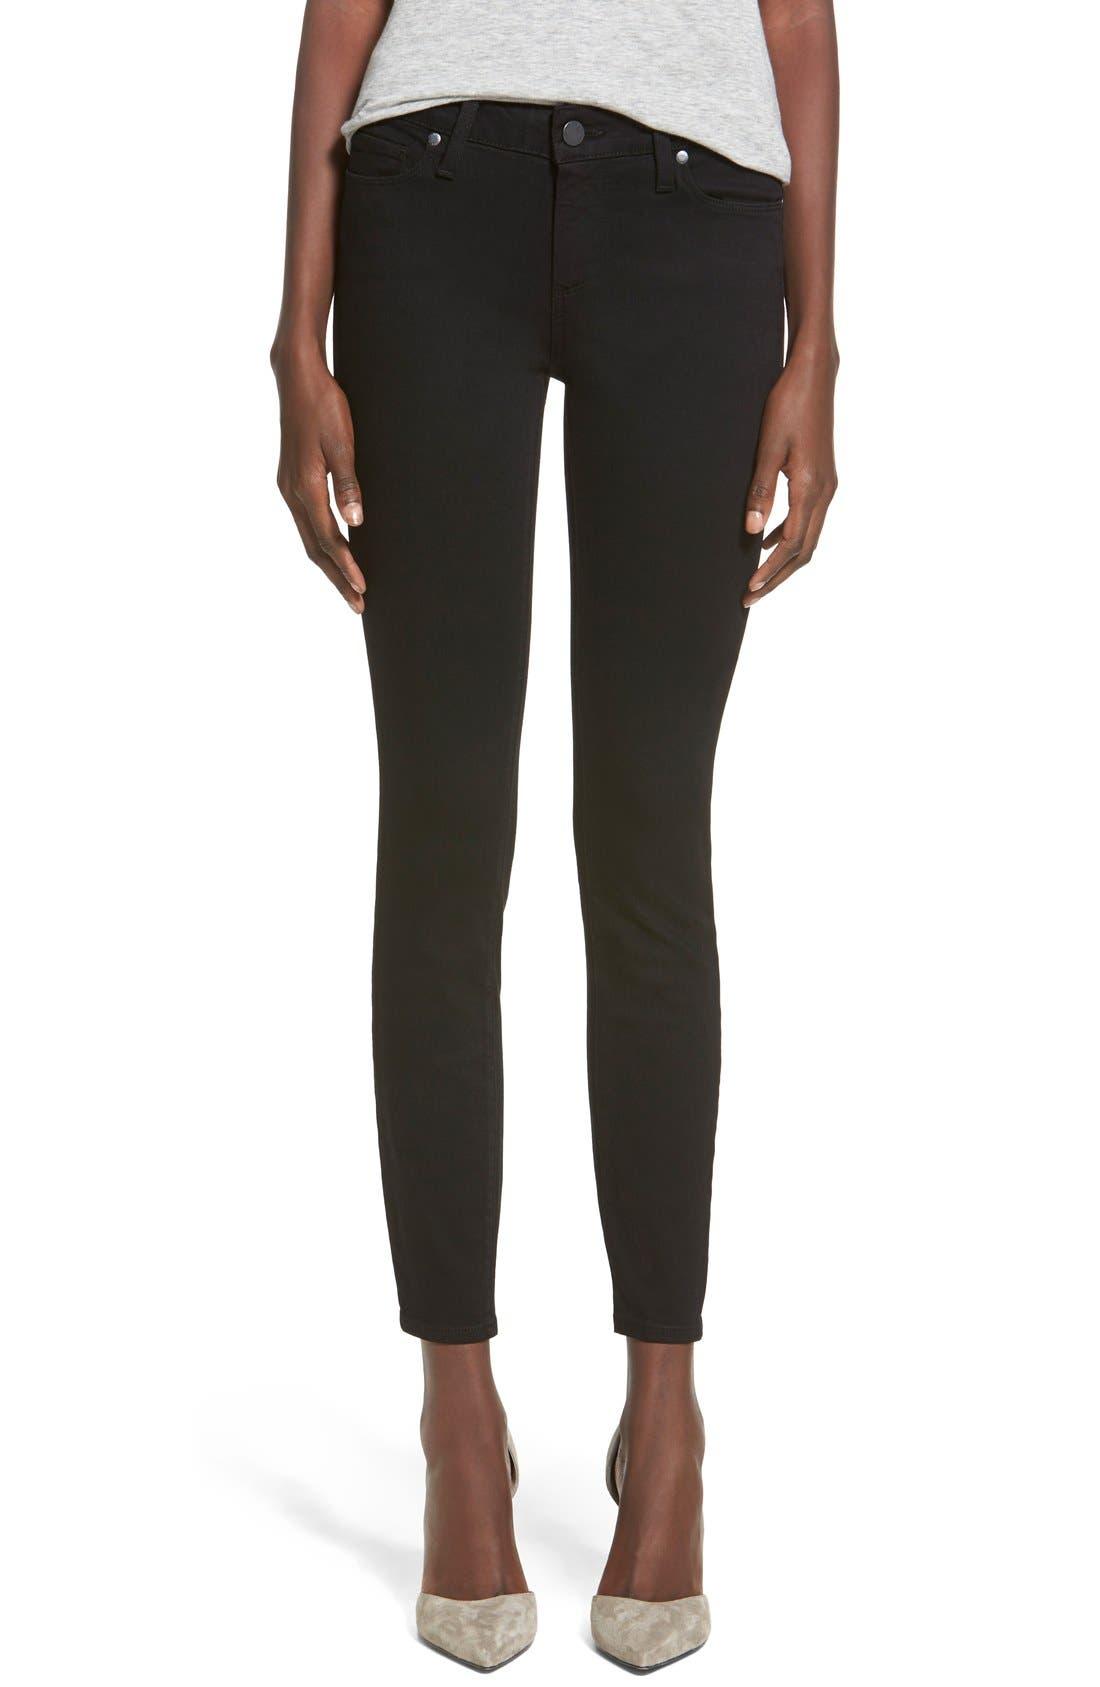 Main Image - PAIGE Transcend - Verdugo Ankle Ultra Skinny Jeans (Black Shadow)